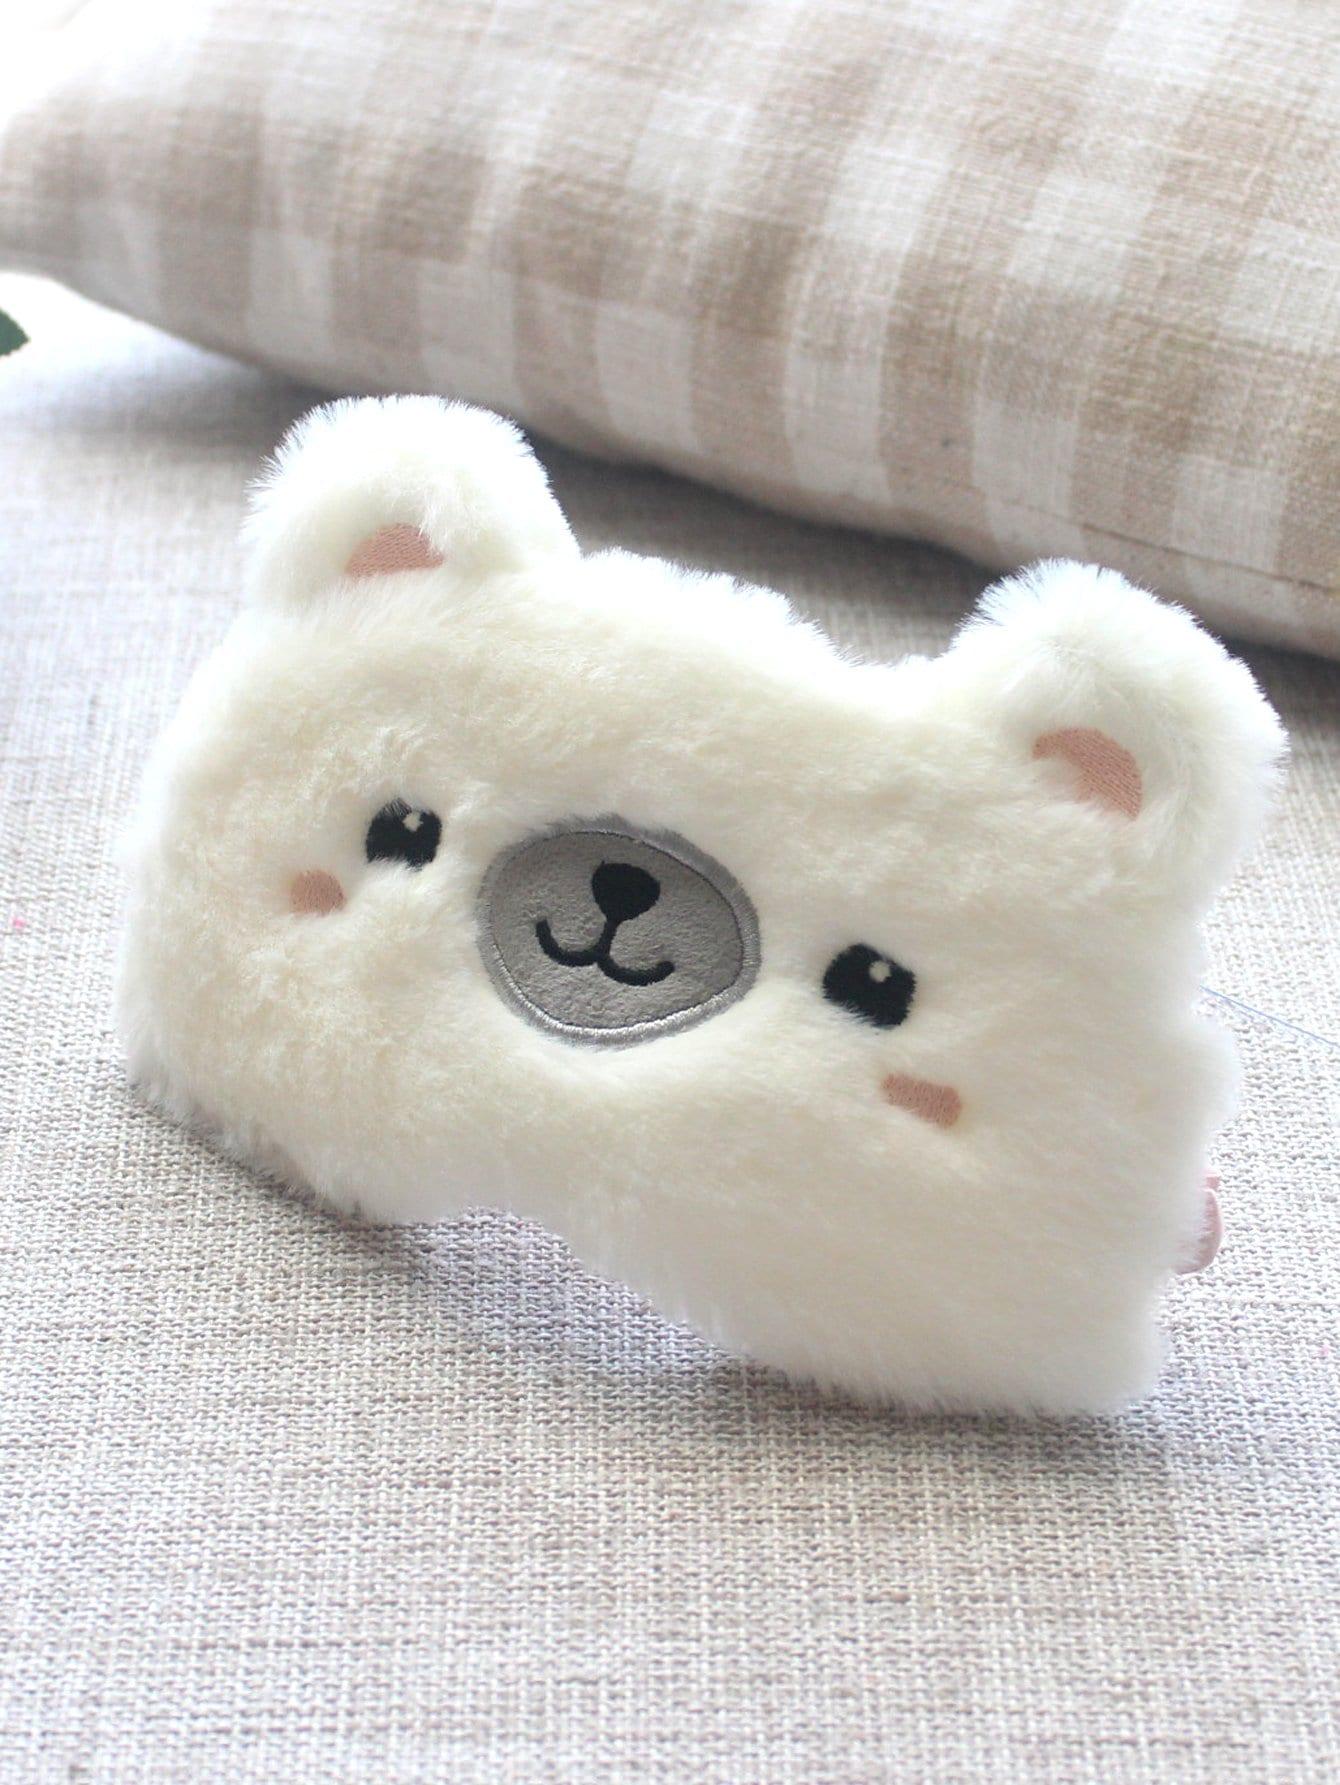 Bear Plush Eye Mask 70cm fluorescent bear wedding birthday gift wholesale creative new large plush bear toys to give their children christmas gifts